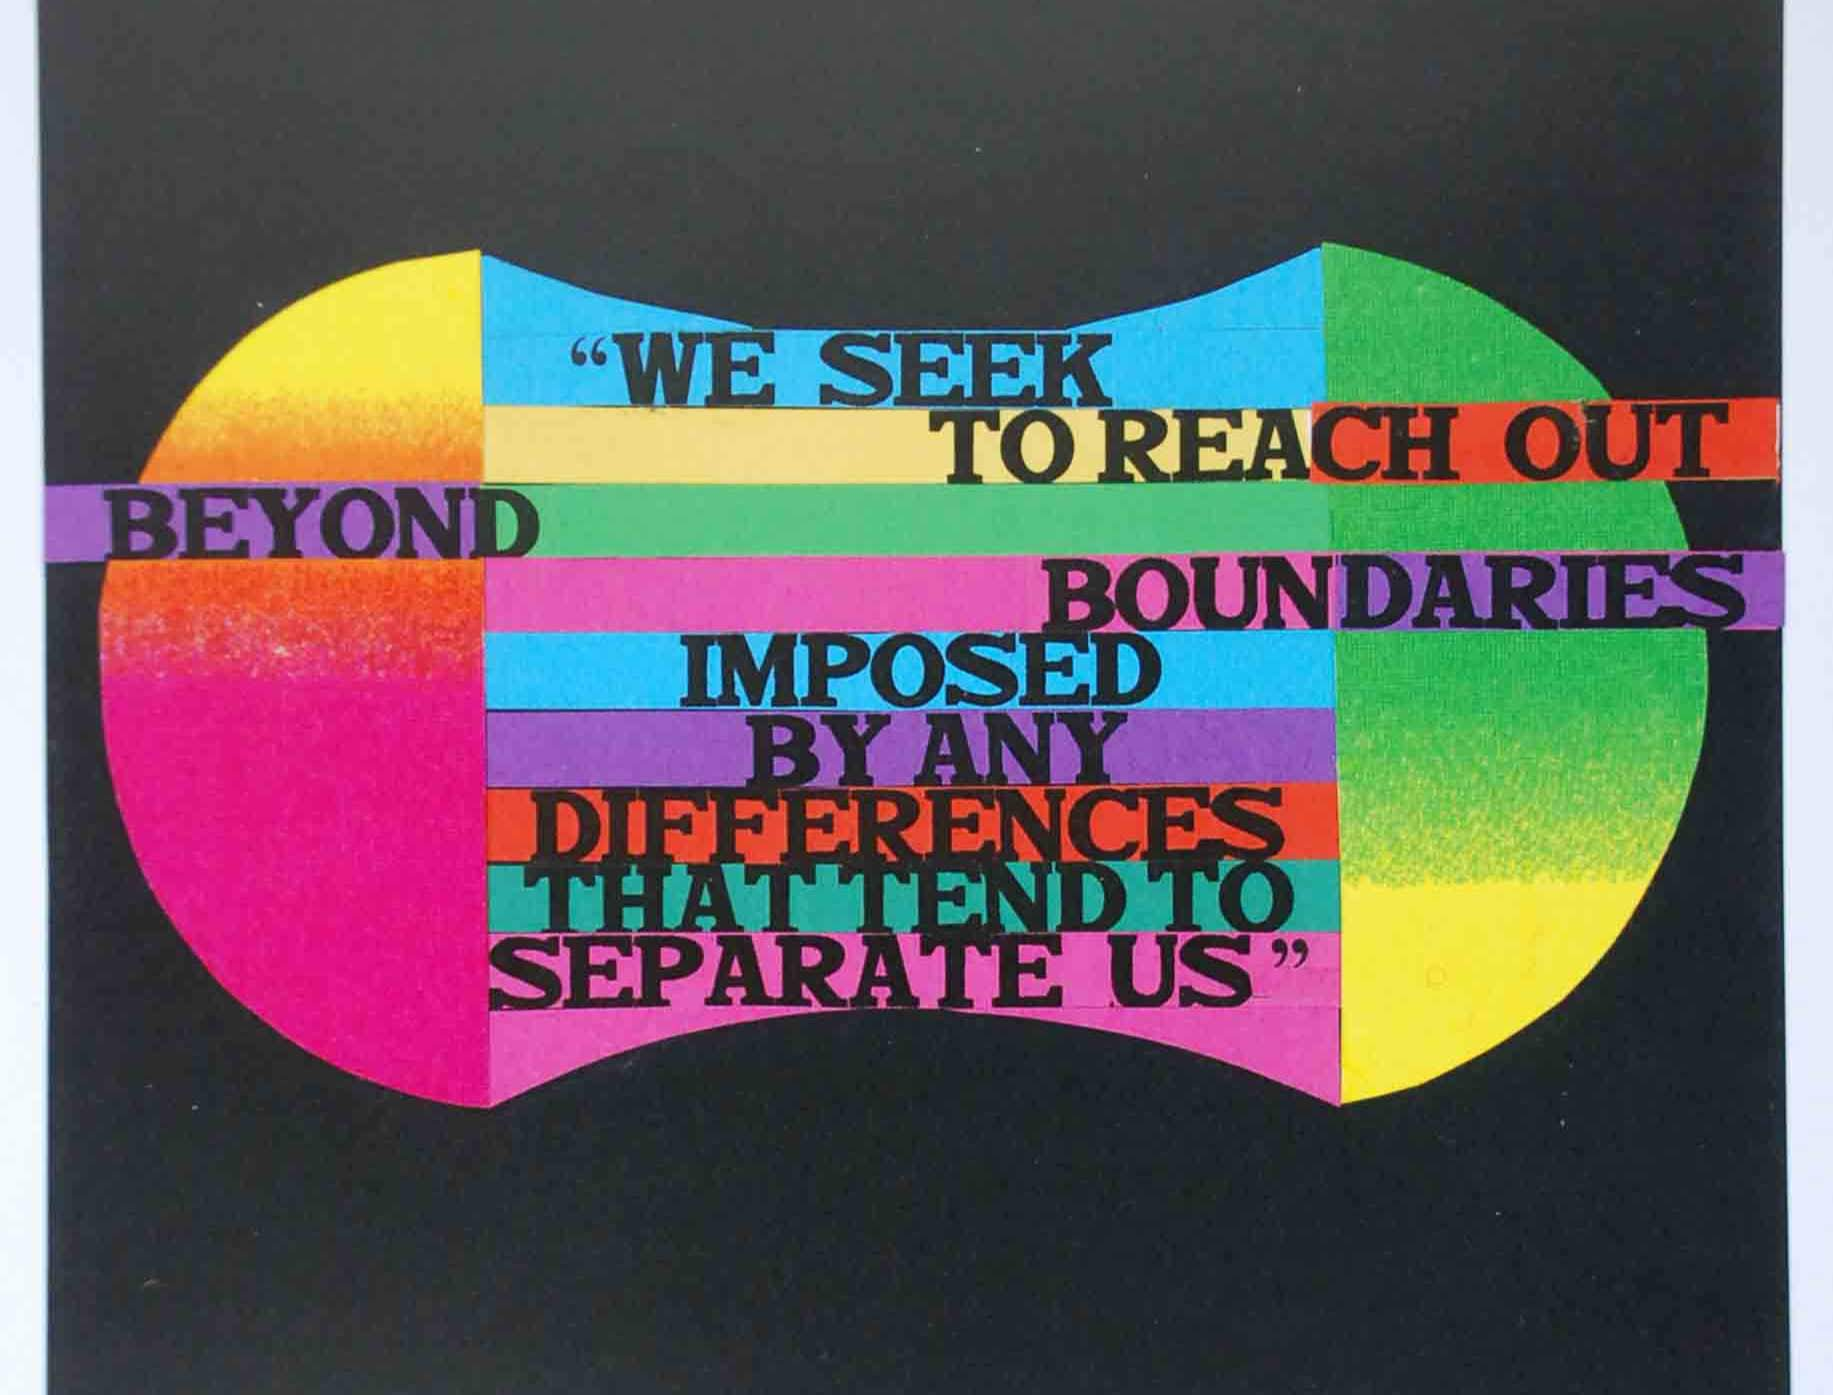 Strobridge art with colorful quote